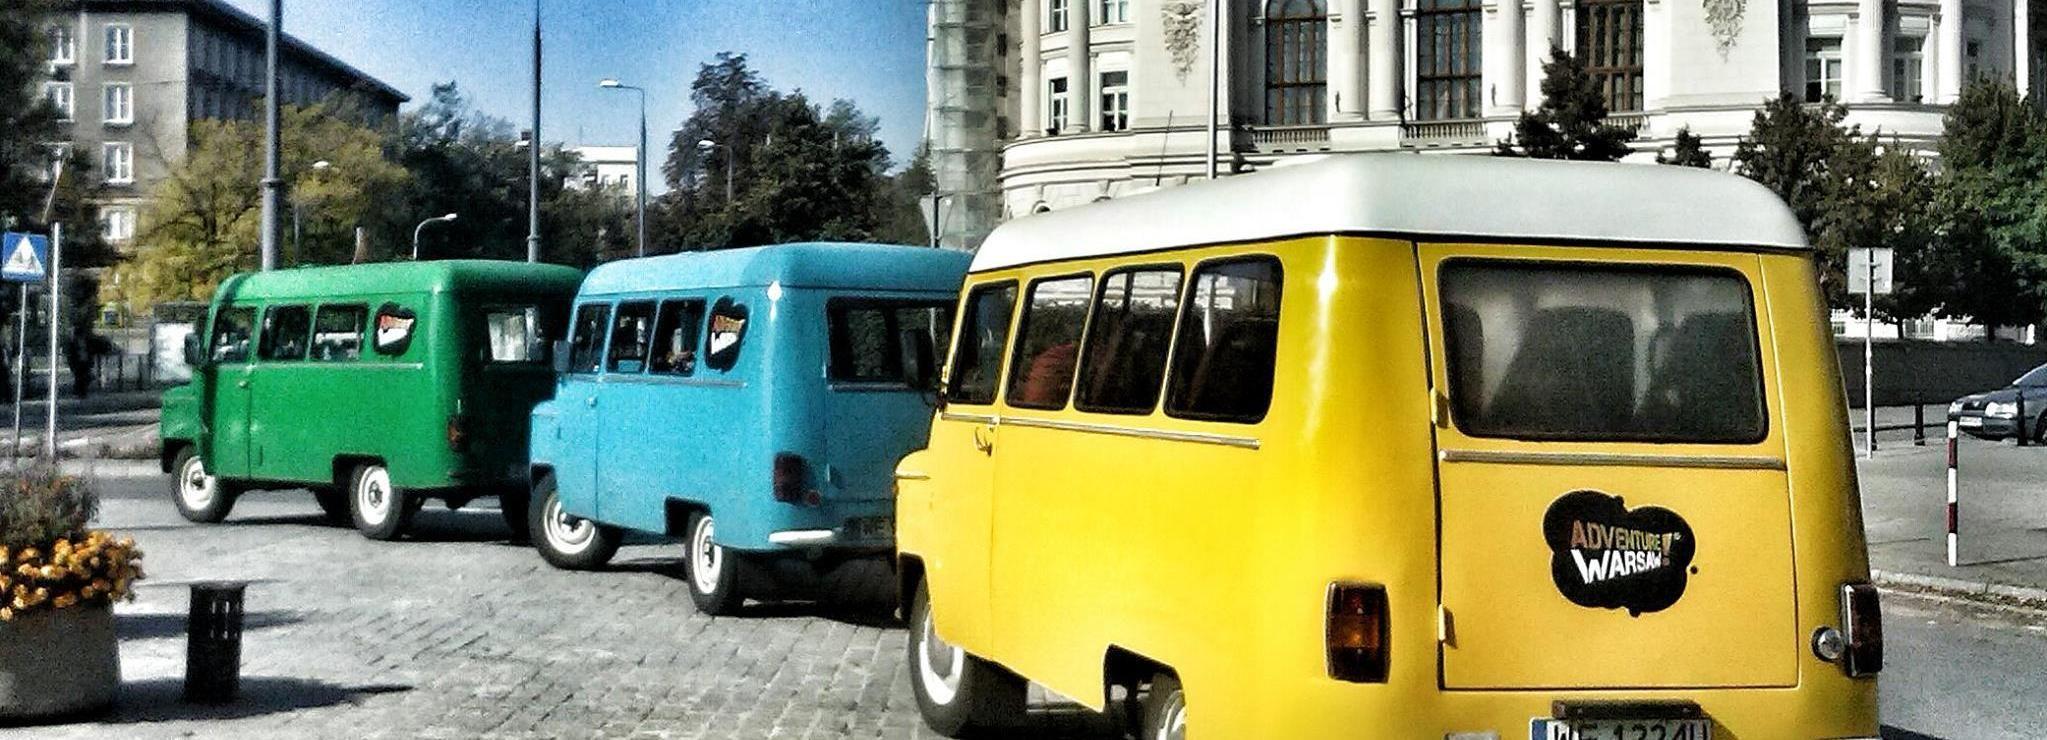 Varsavia: tour ebraico privato d'auto d'epoca